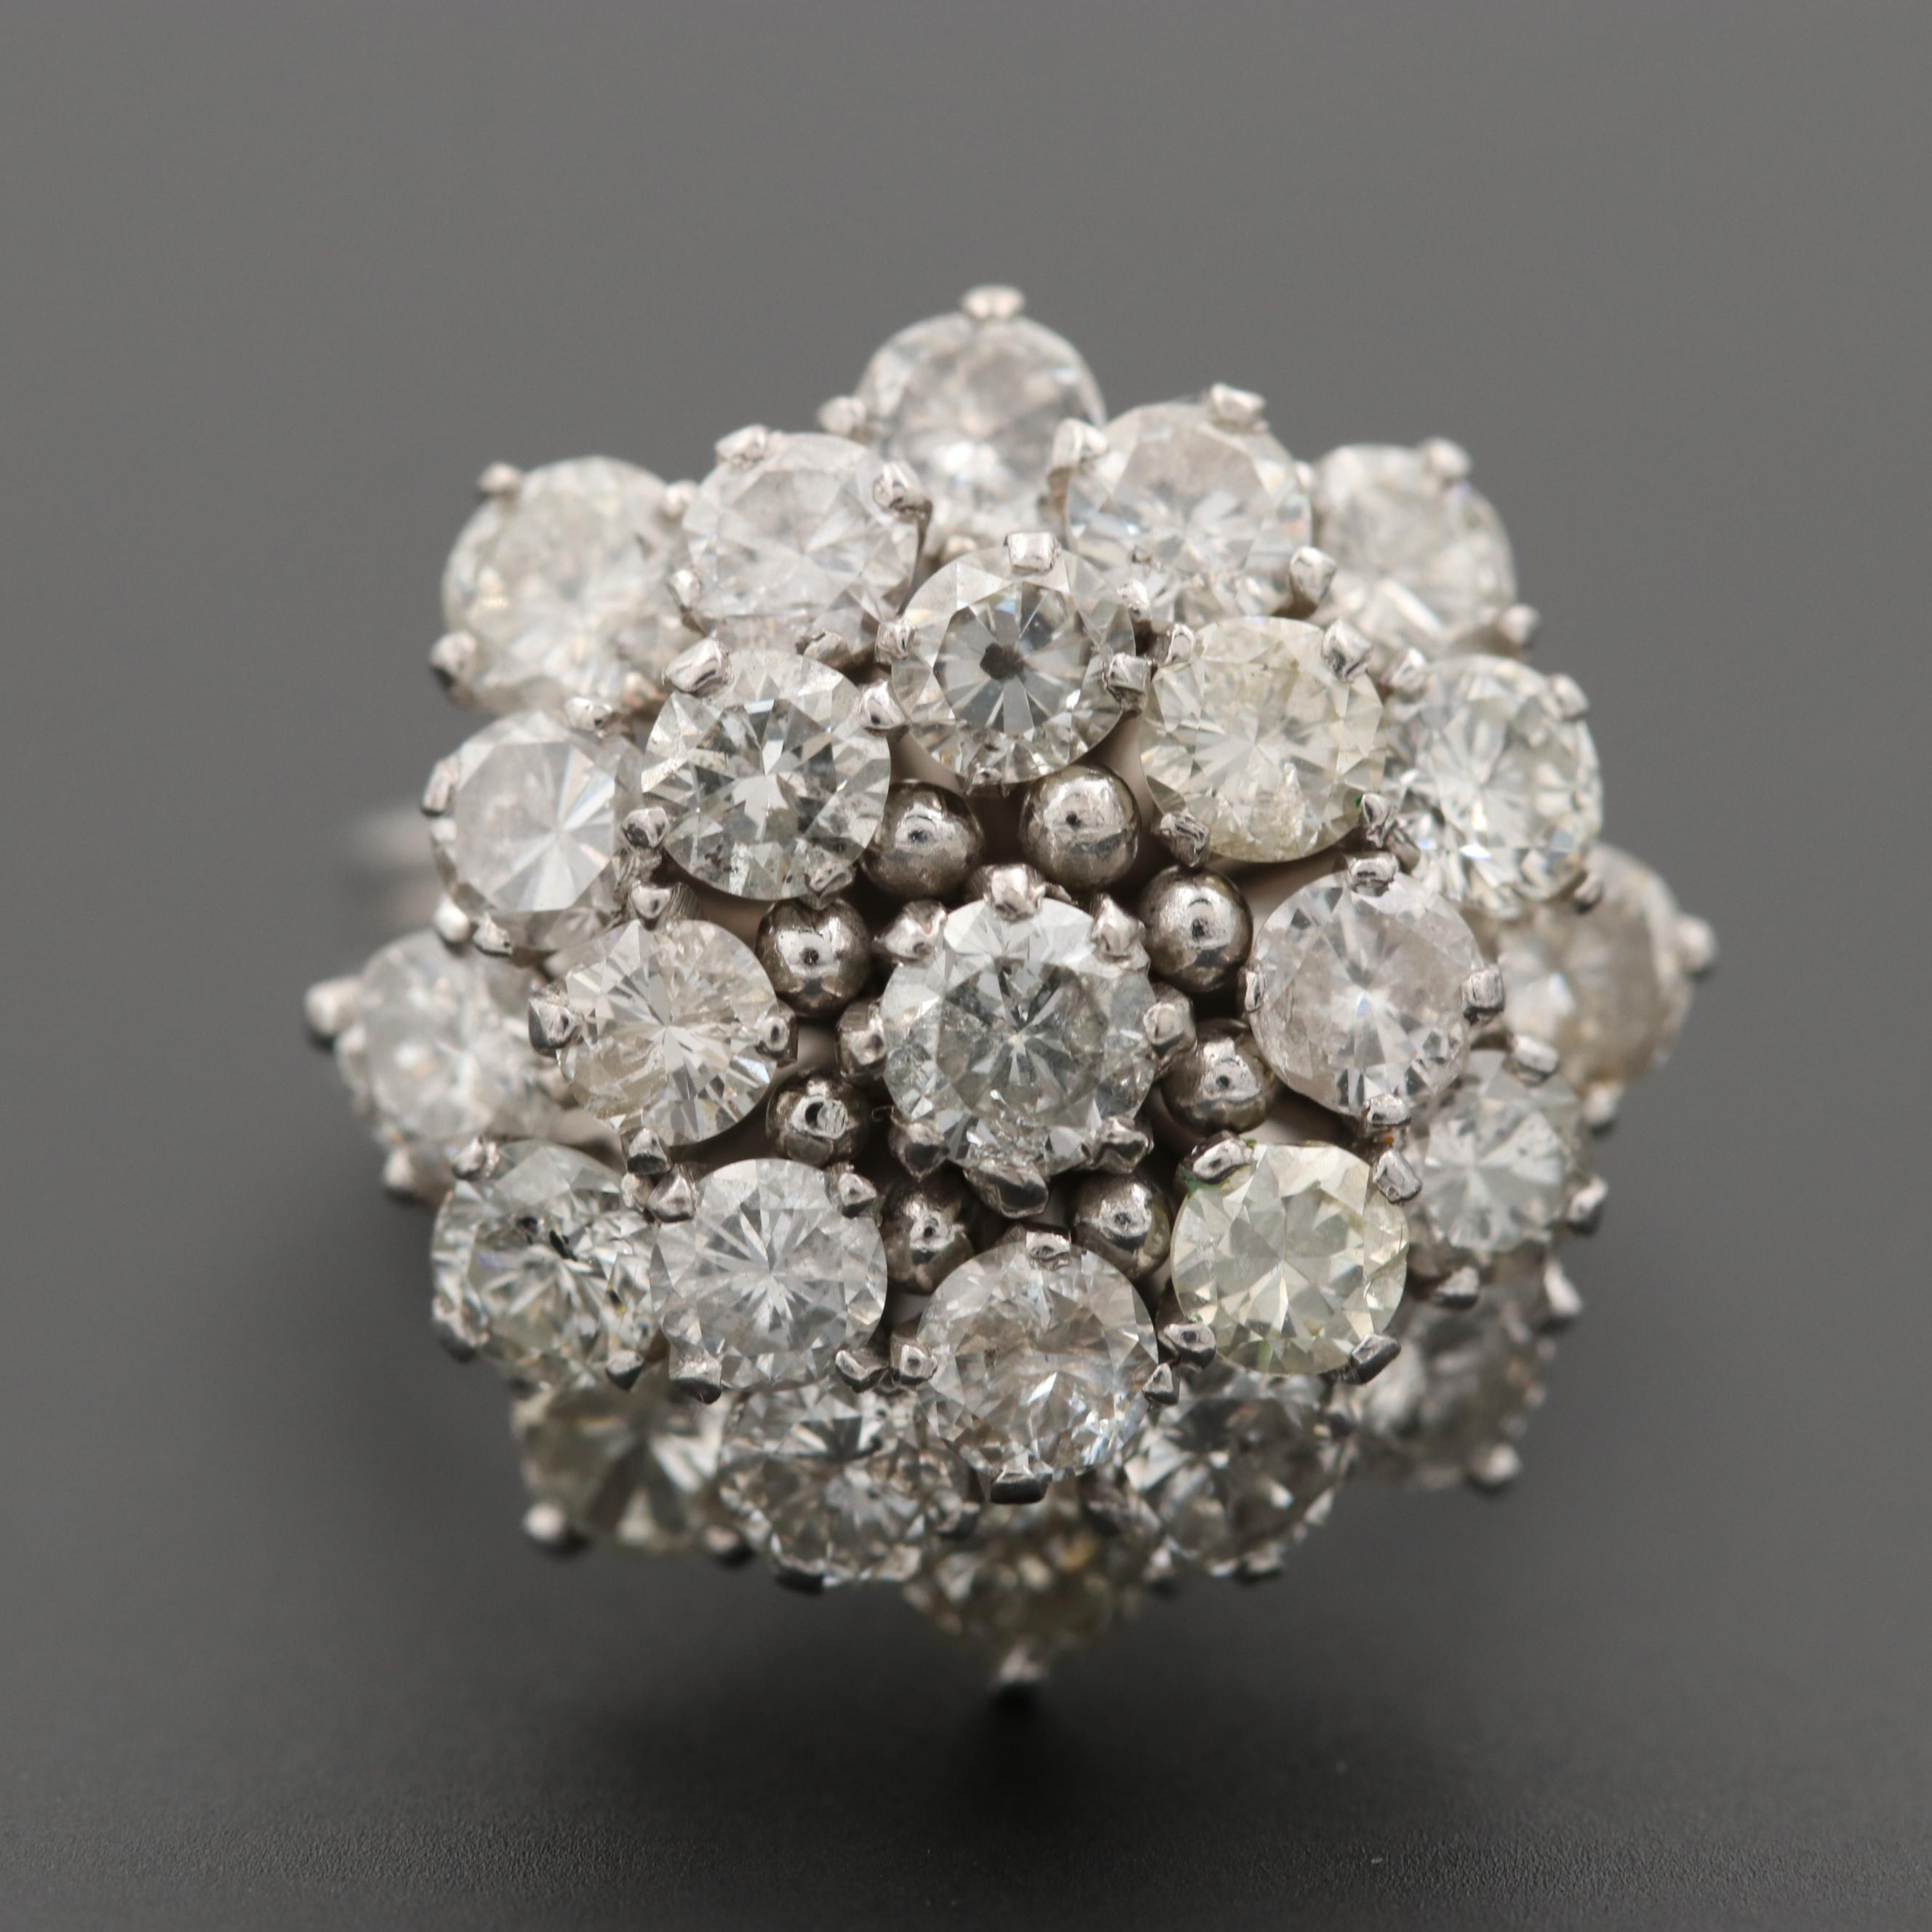 Vintage 10K White Gold 4.04 CTW Diamond Cluster Ring